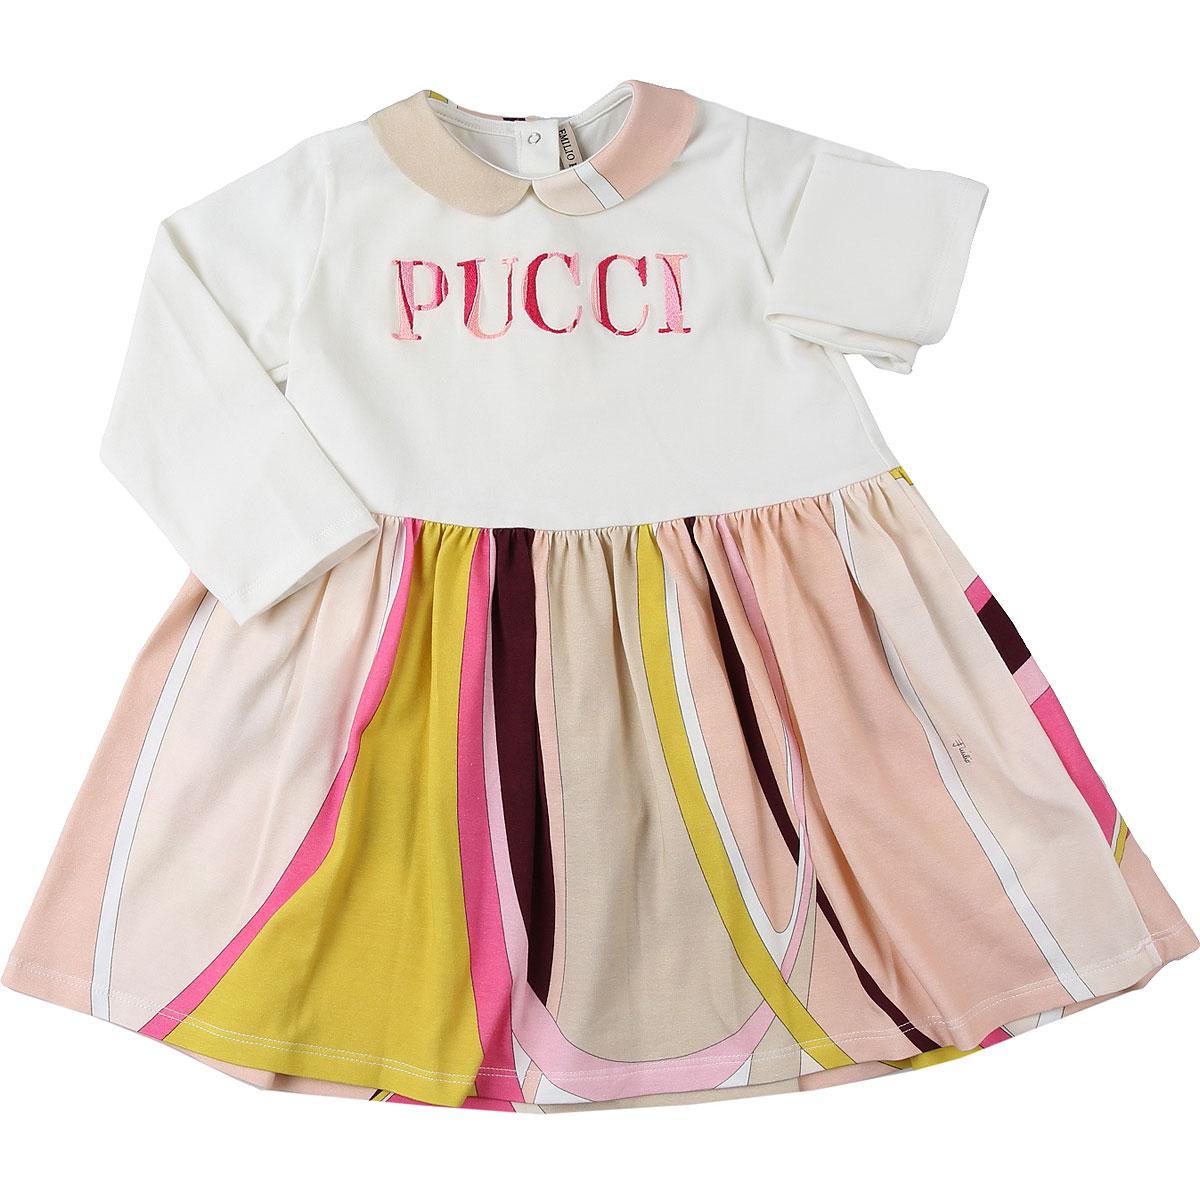 Emilio Pucci Baby Dress for Girls On Sale, Multicolor, Cotton, 2019, 12M 18M 2Y 6M 9M